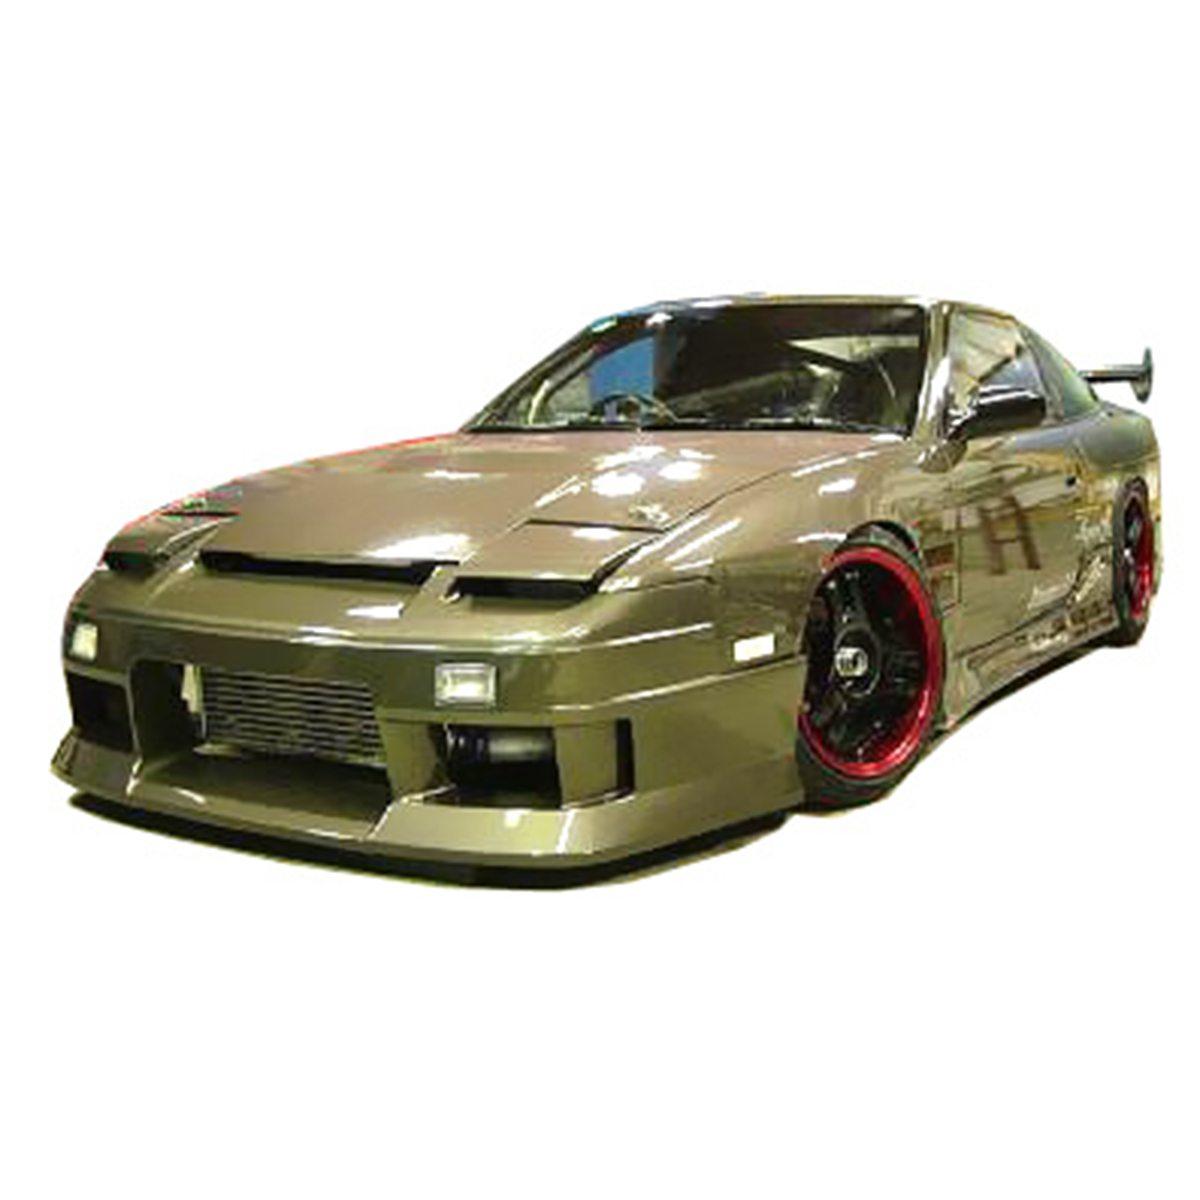 Nissan-SX180-200-S13-Silvia-Frt-PCU1195